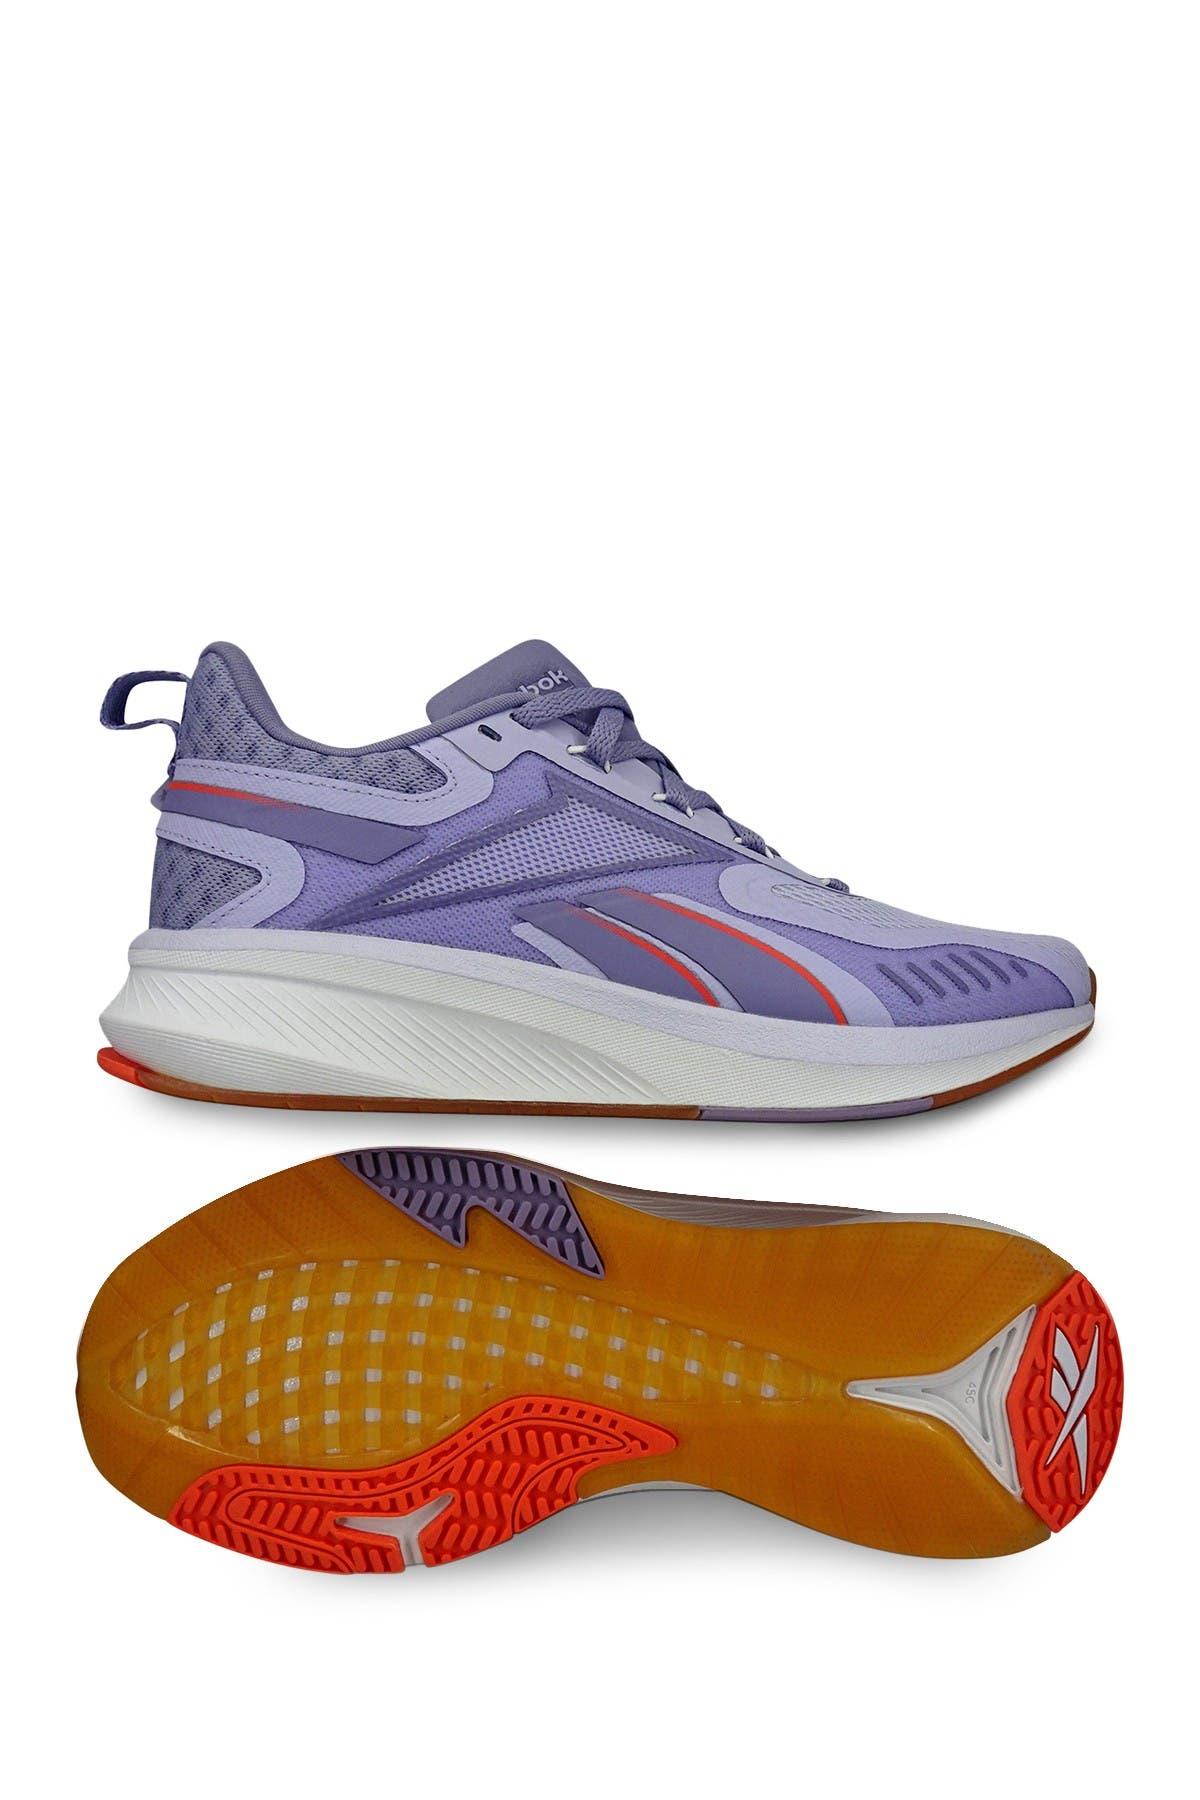 Image of Reebok Fusium Run 2.0 Sneaker